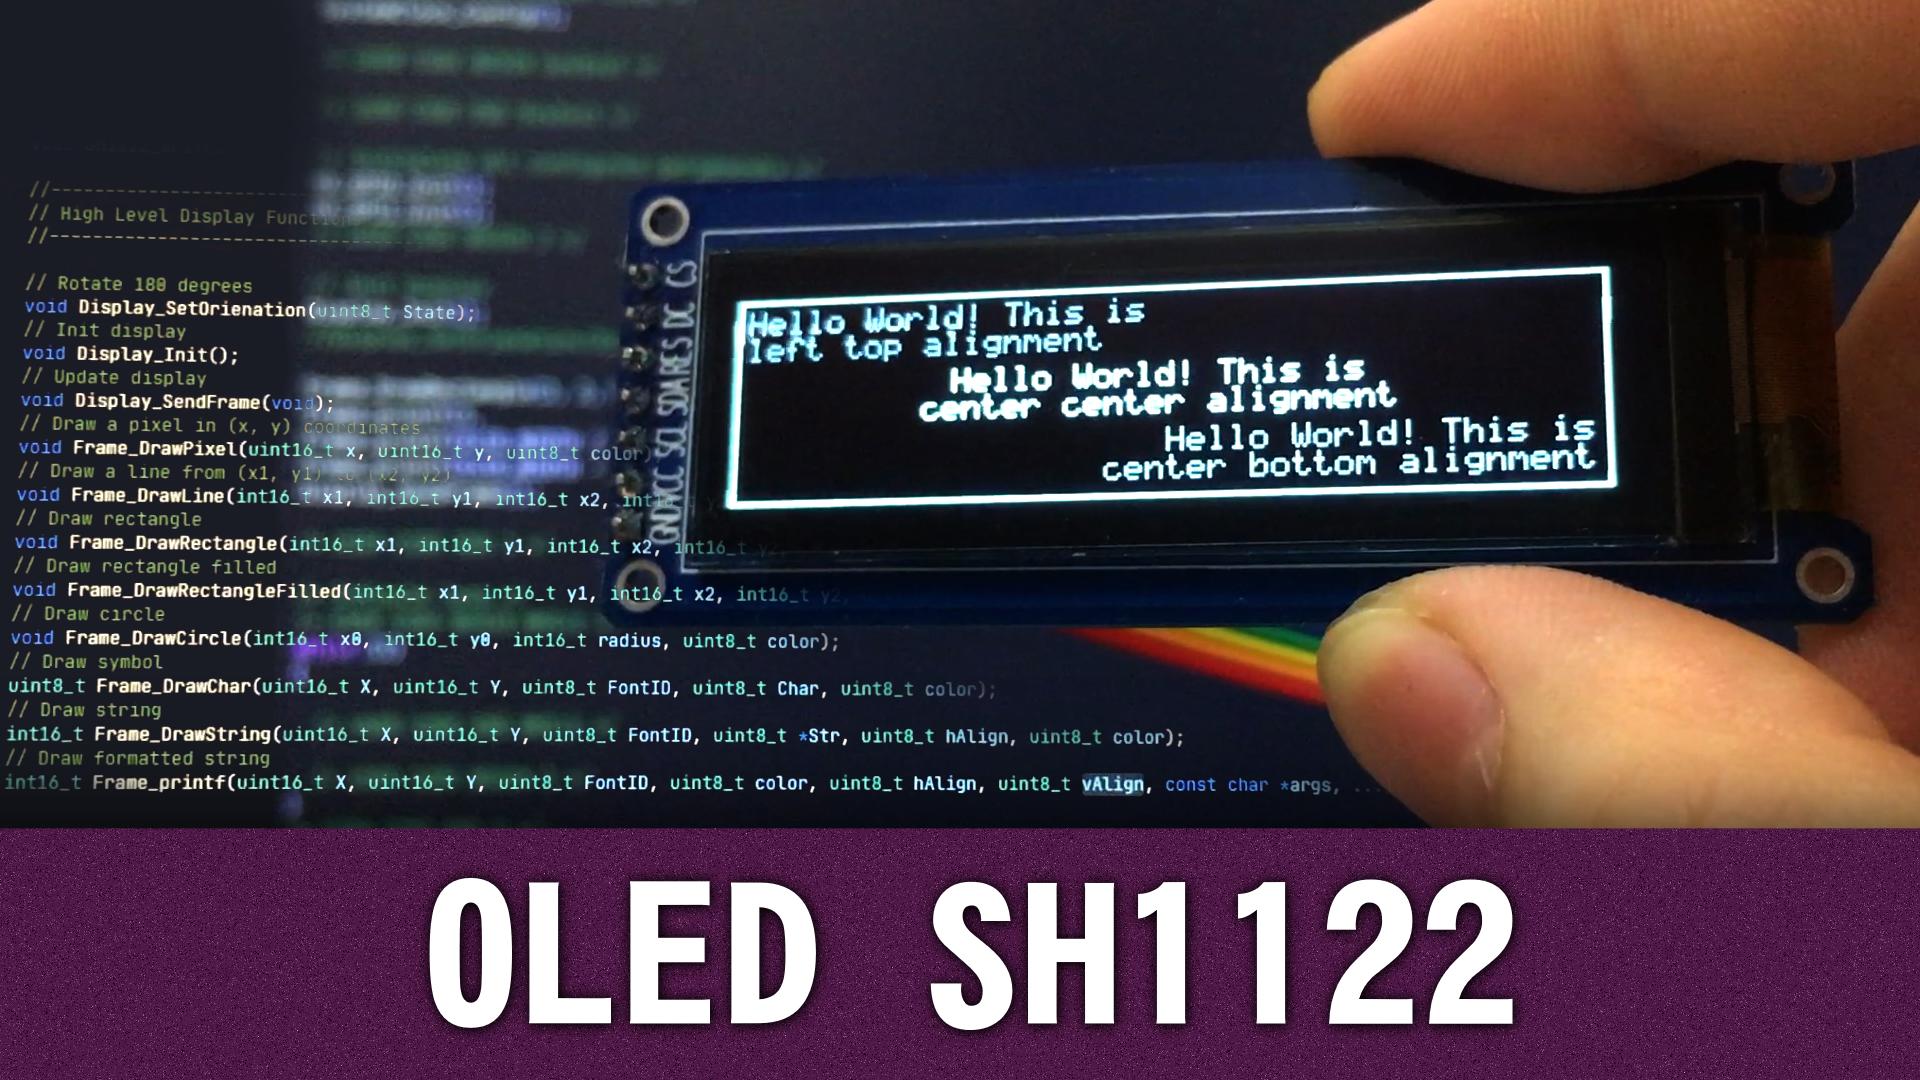 OLED дисплей на контроллере SH1122 - STM32 HAL драйвер